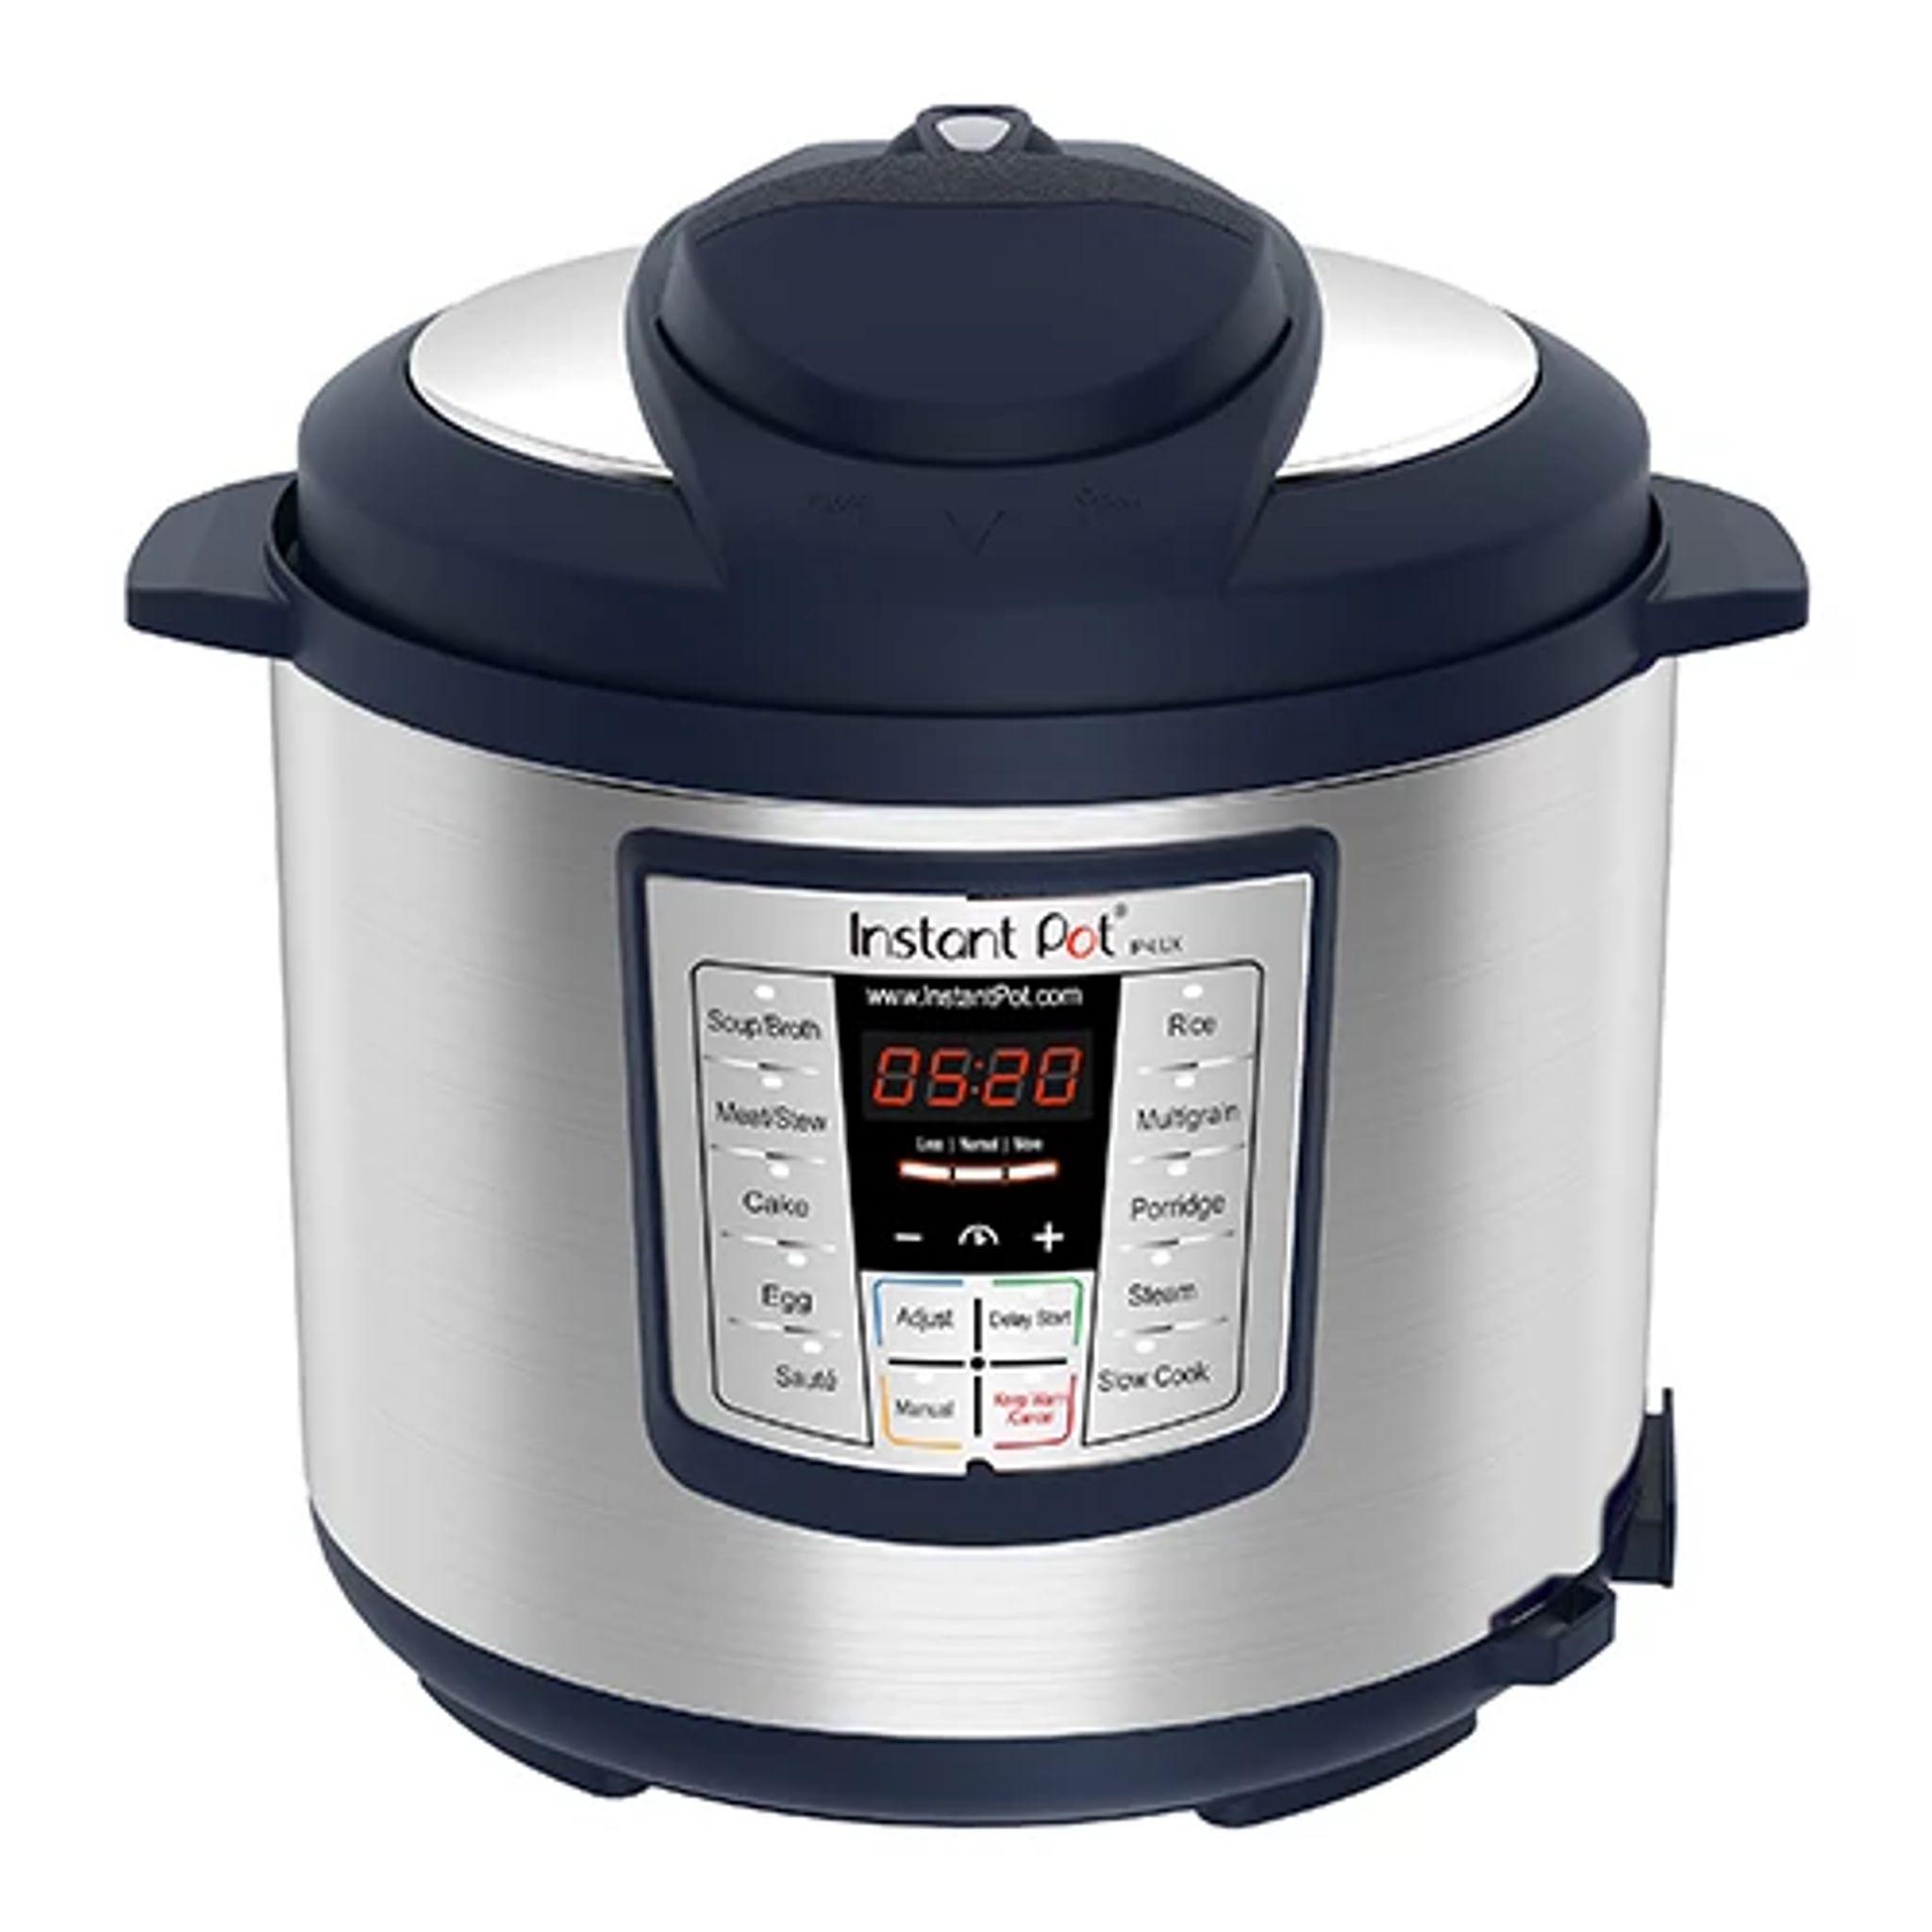 Instant Pot Lux 6-quart Multi-Use Pressure Cooker, Blue